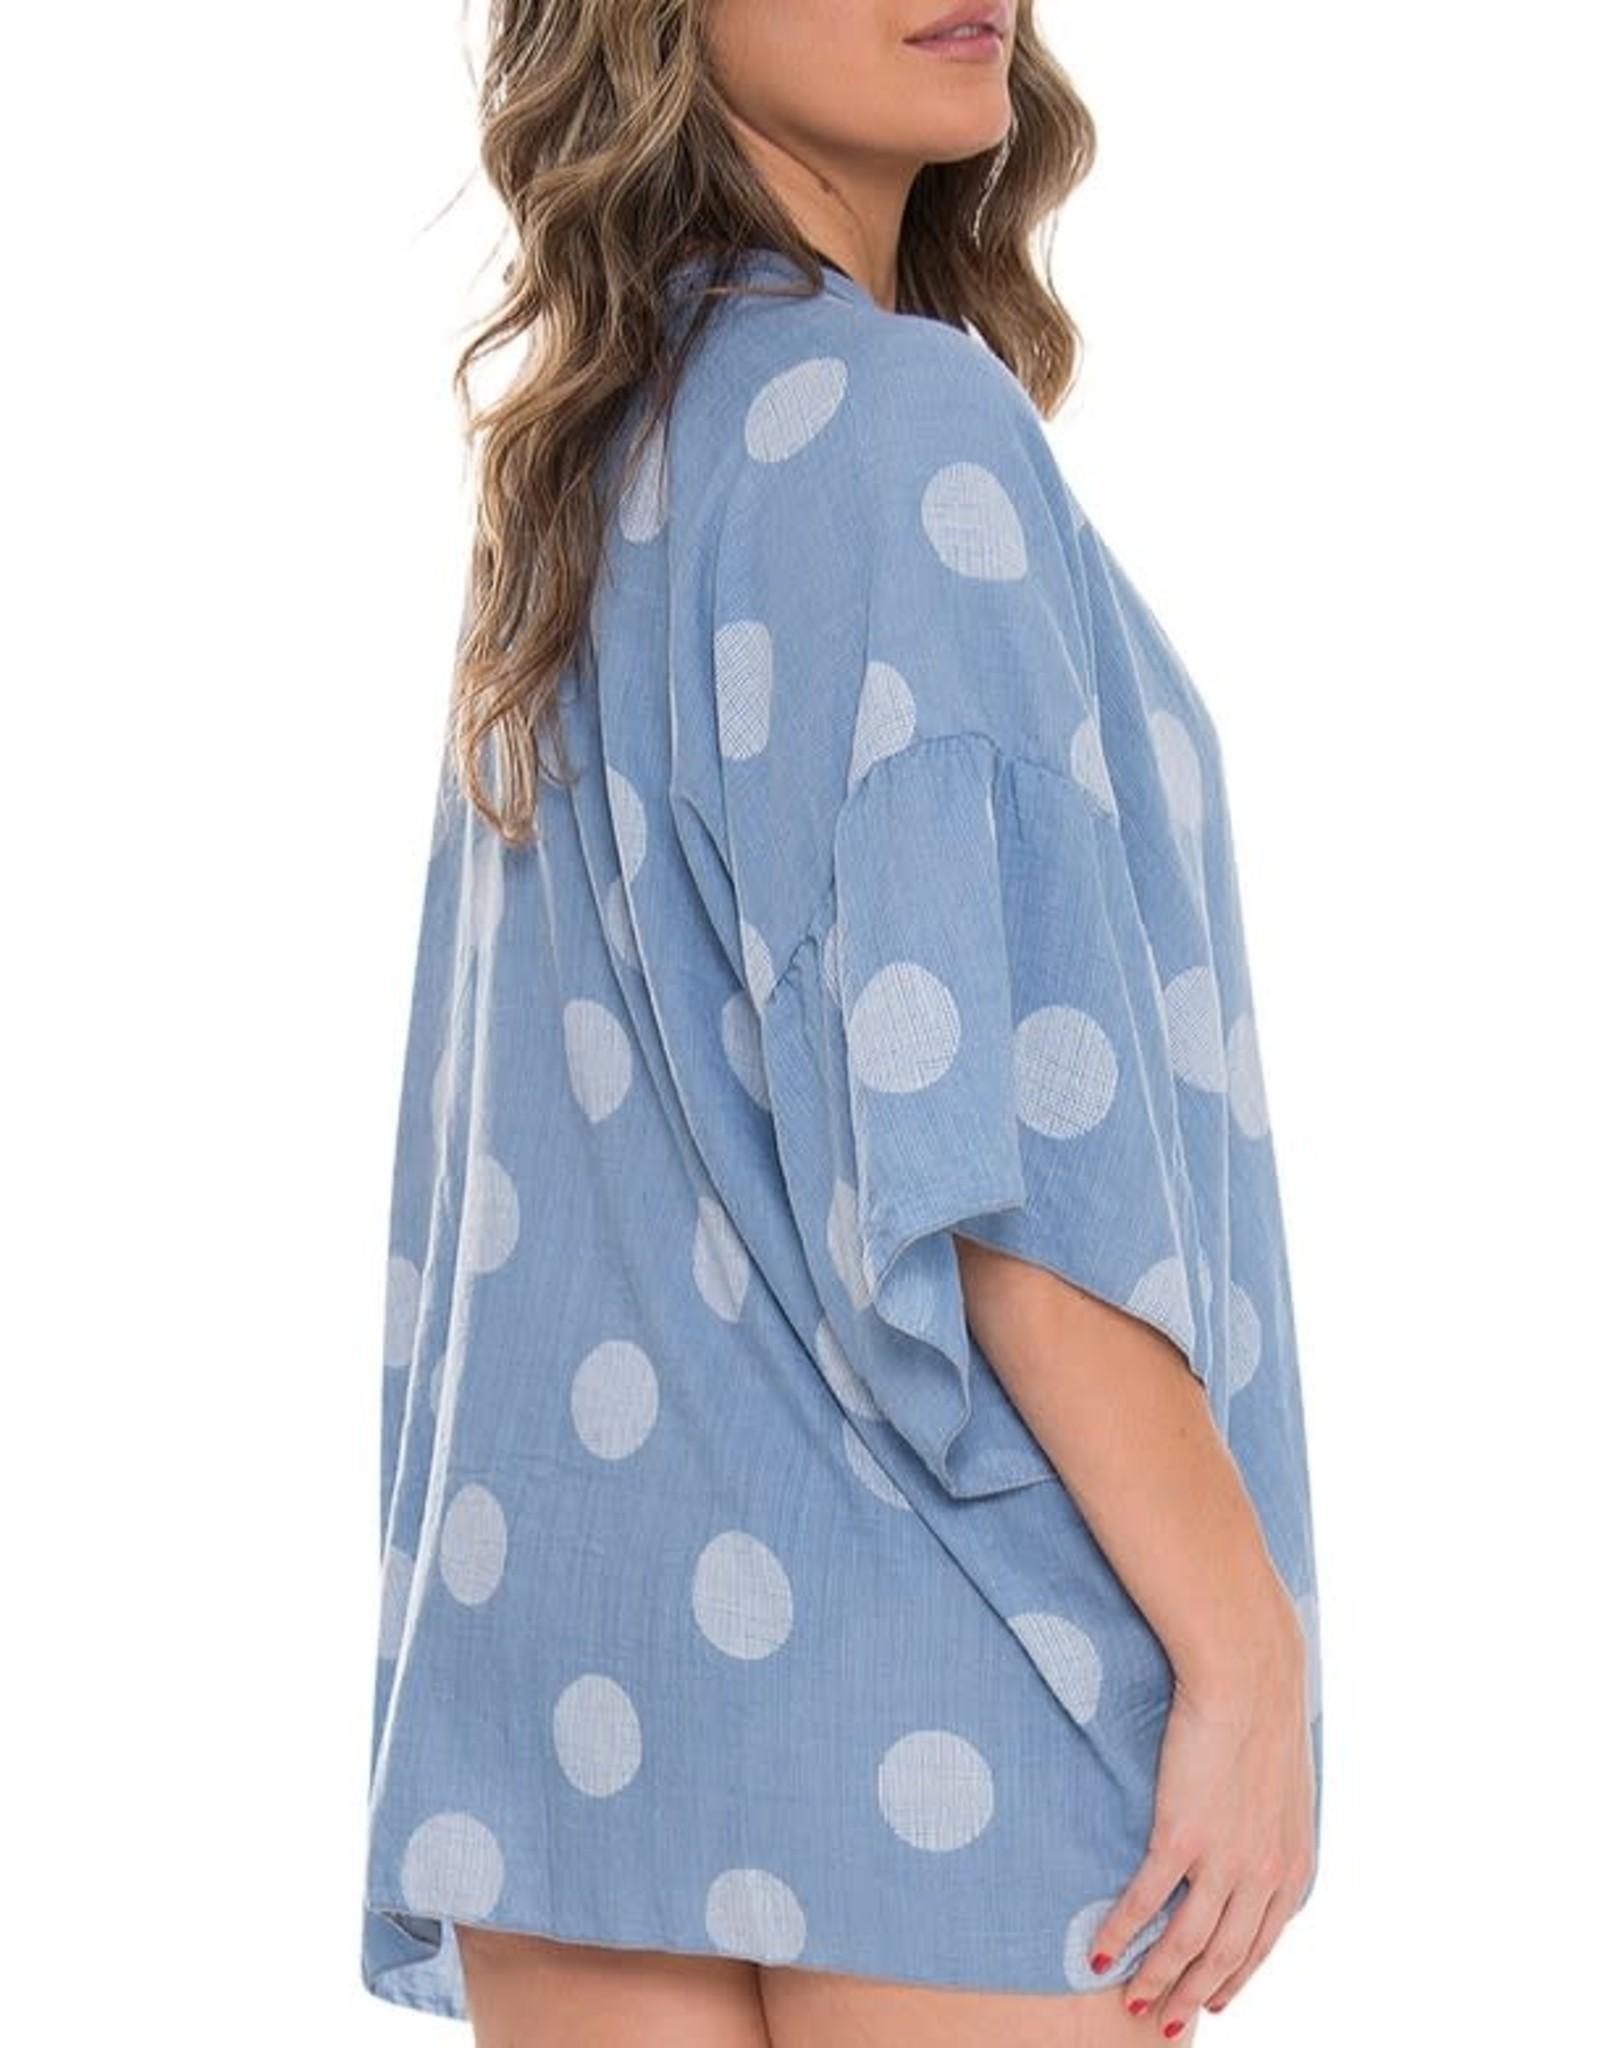 Fashion City MOMENTS Kimono/ Swim Cover- Blue